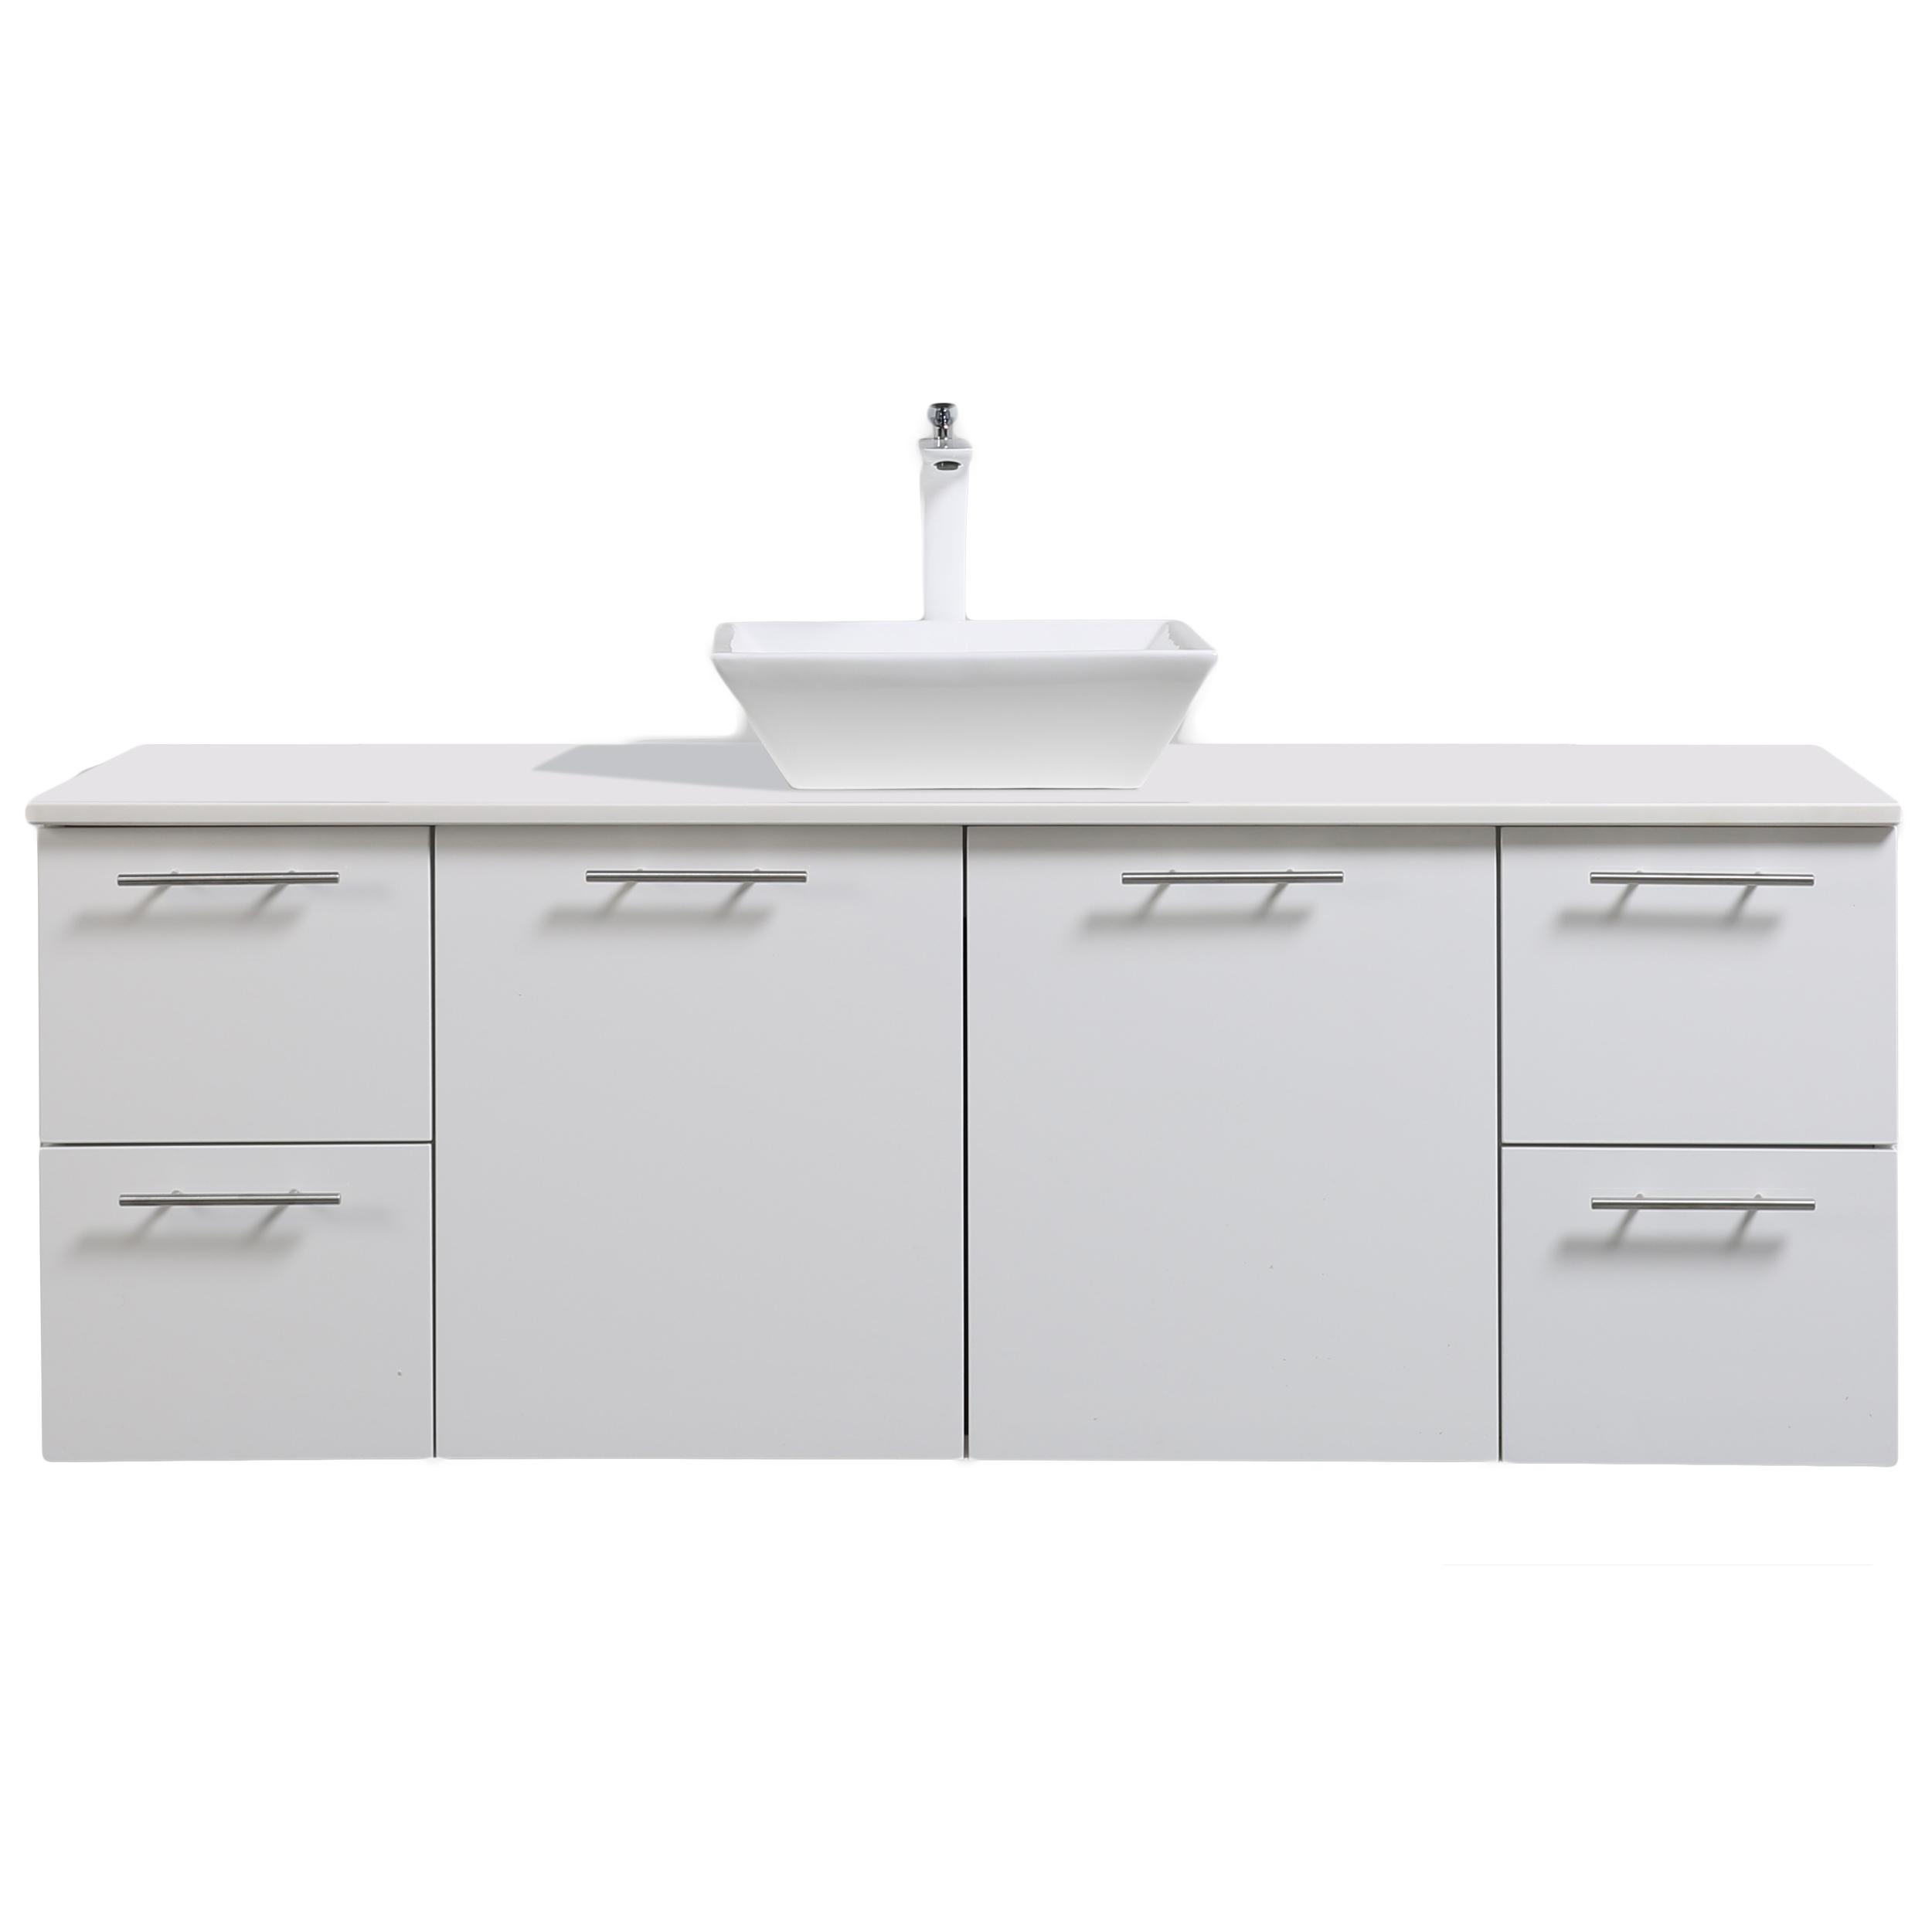 Eviva Luxury 60 inch White Single Sink bathroom vanity with top